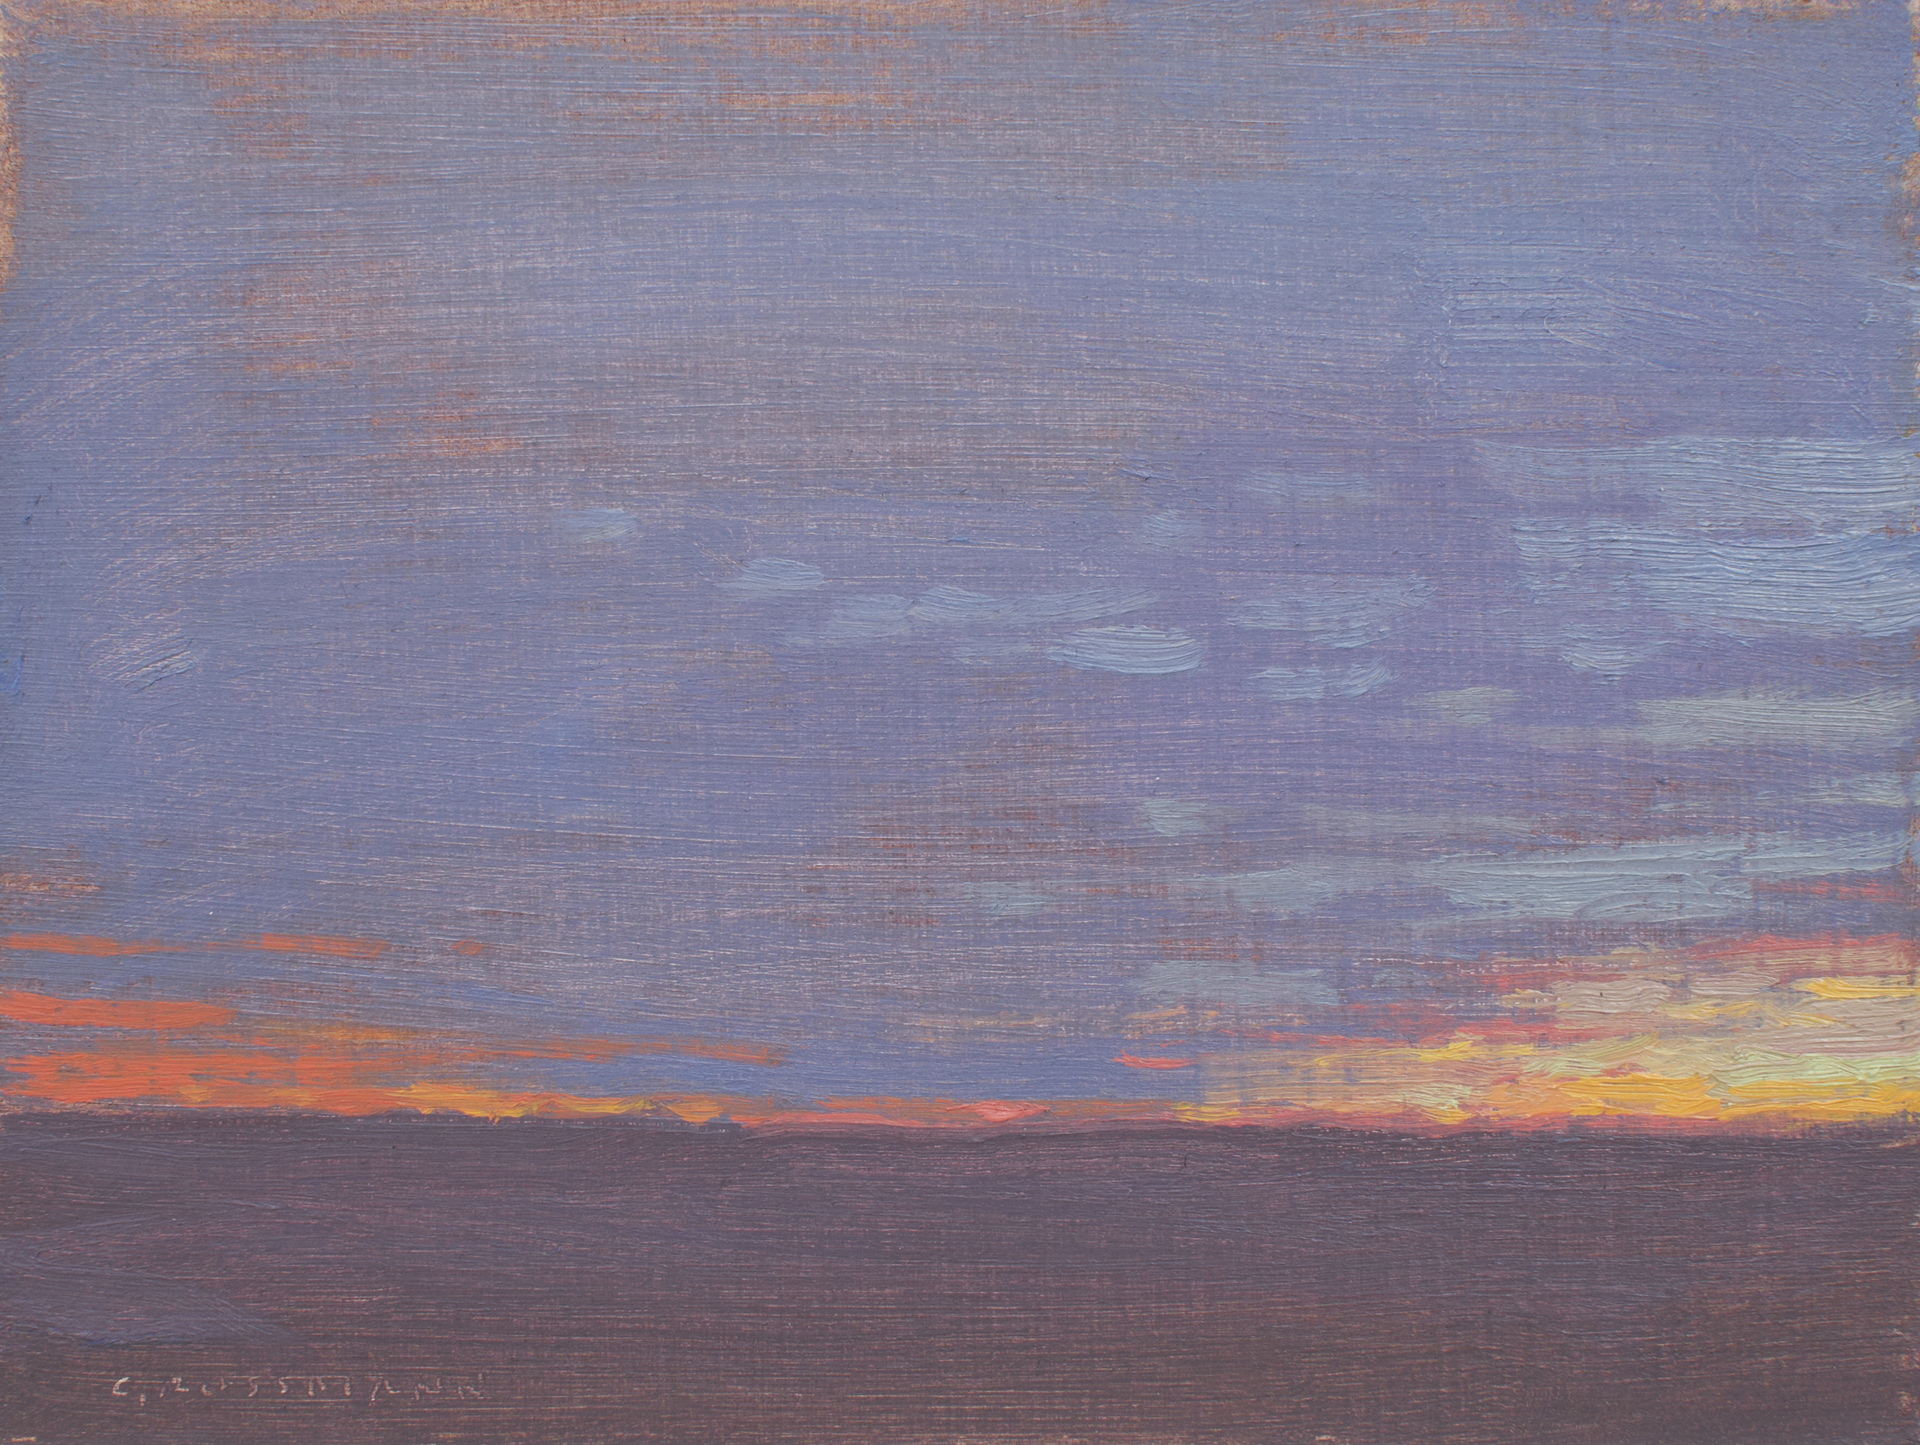 Winter Solstice Dusk by David Grossmann